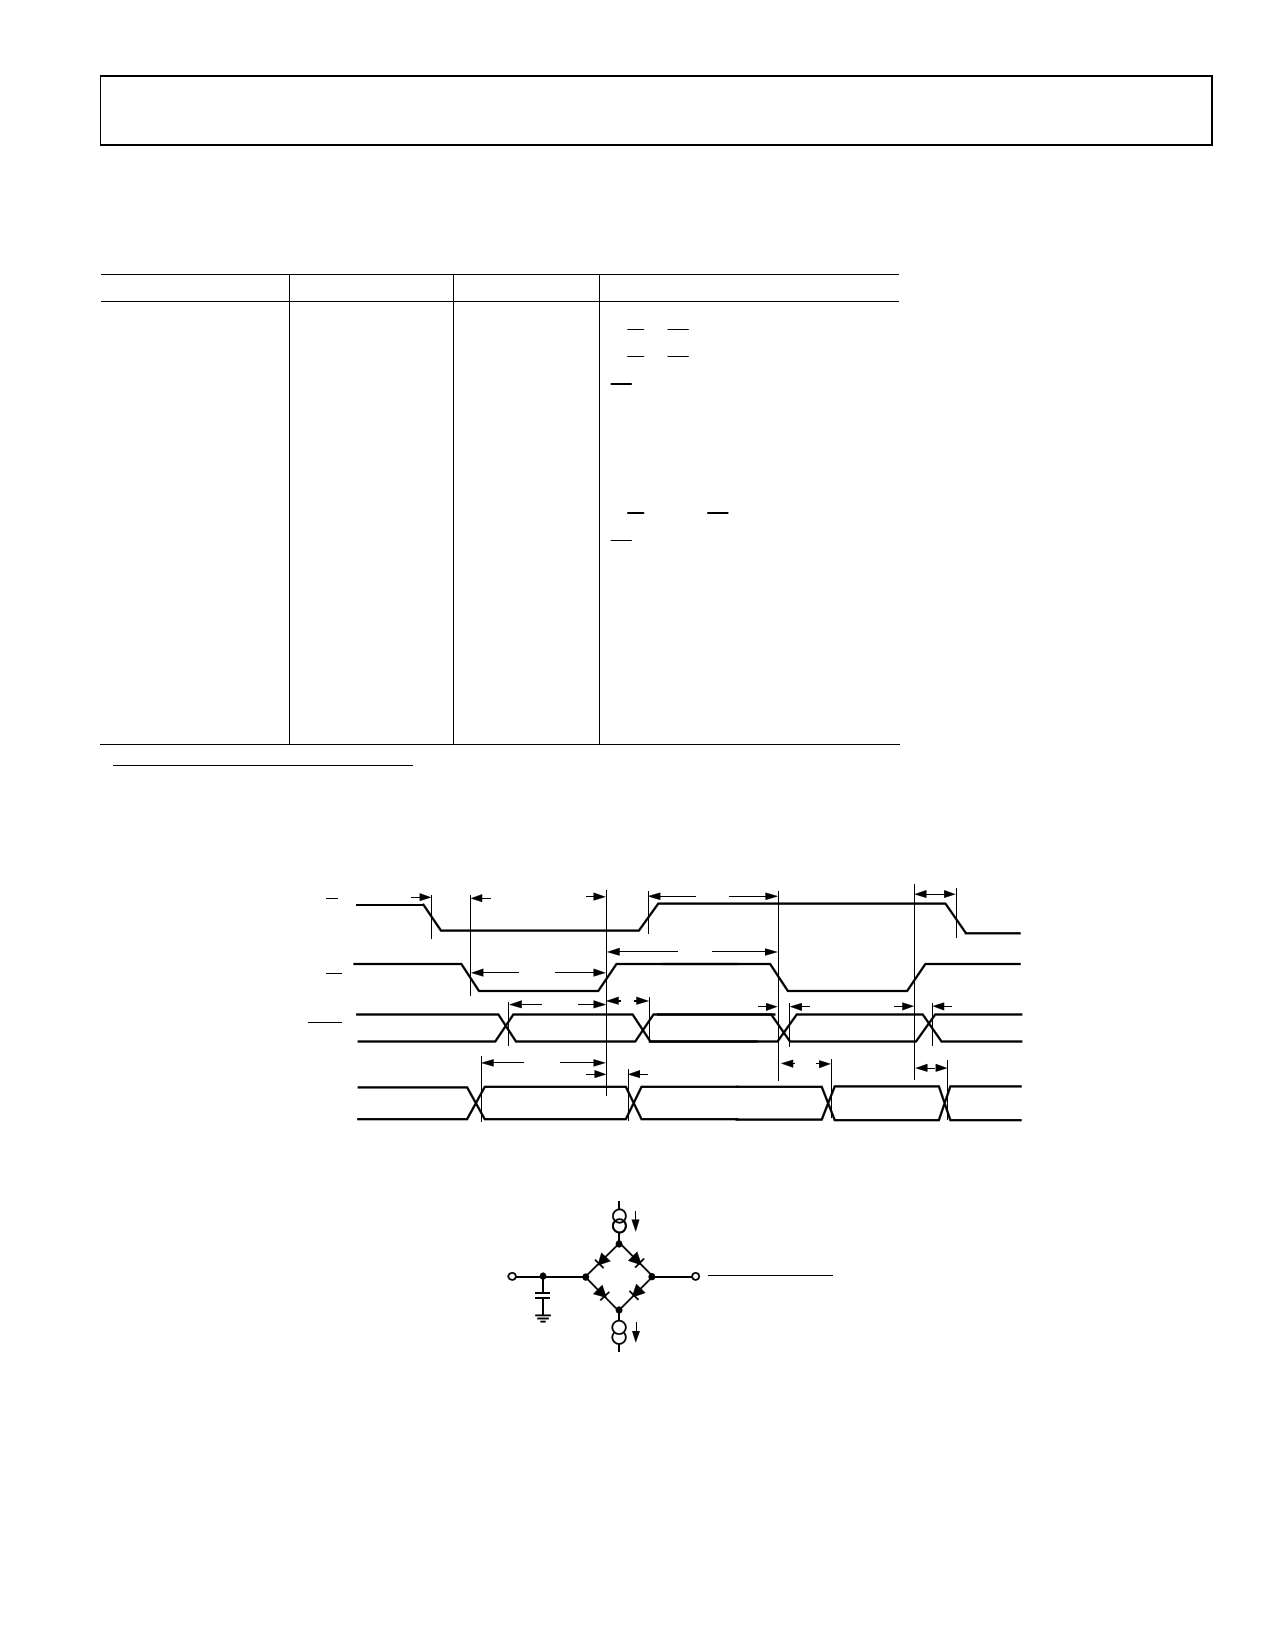 AD5405 pdf, arduino